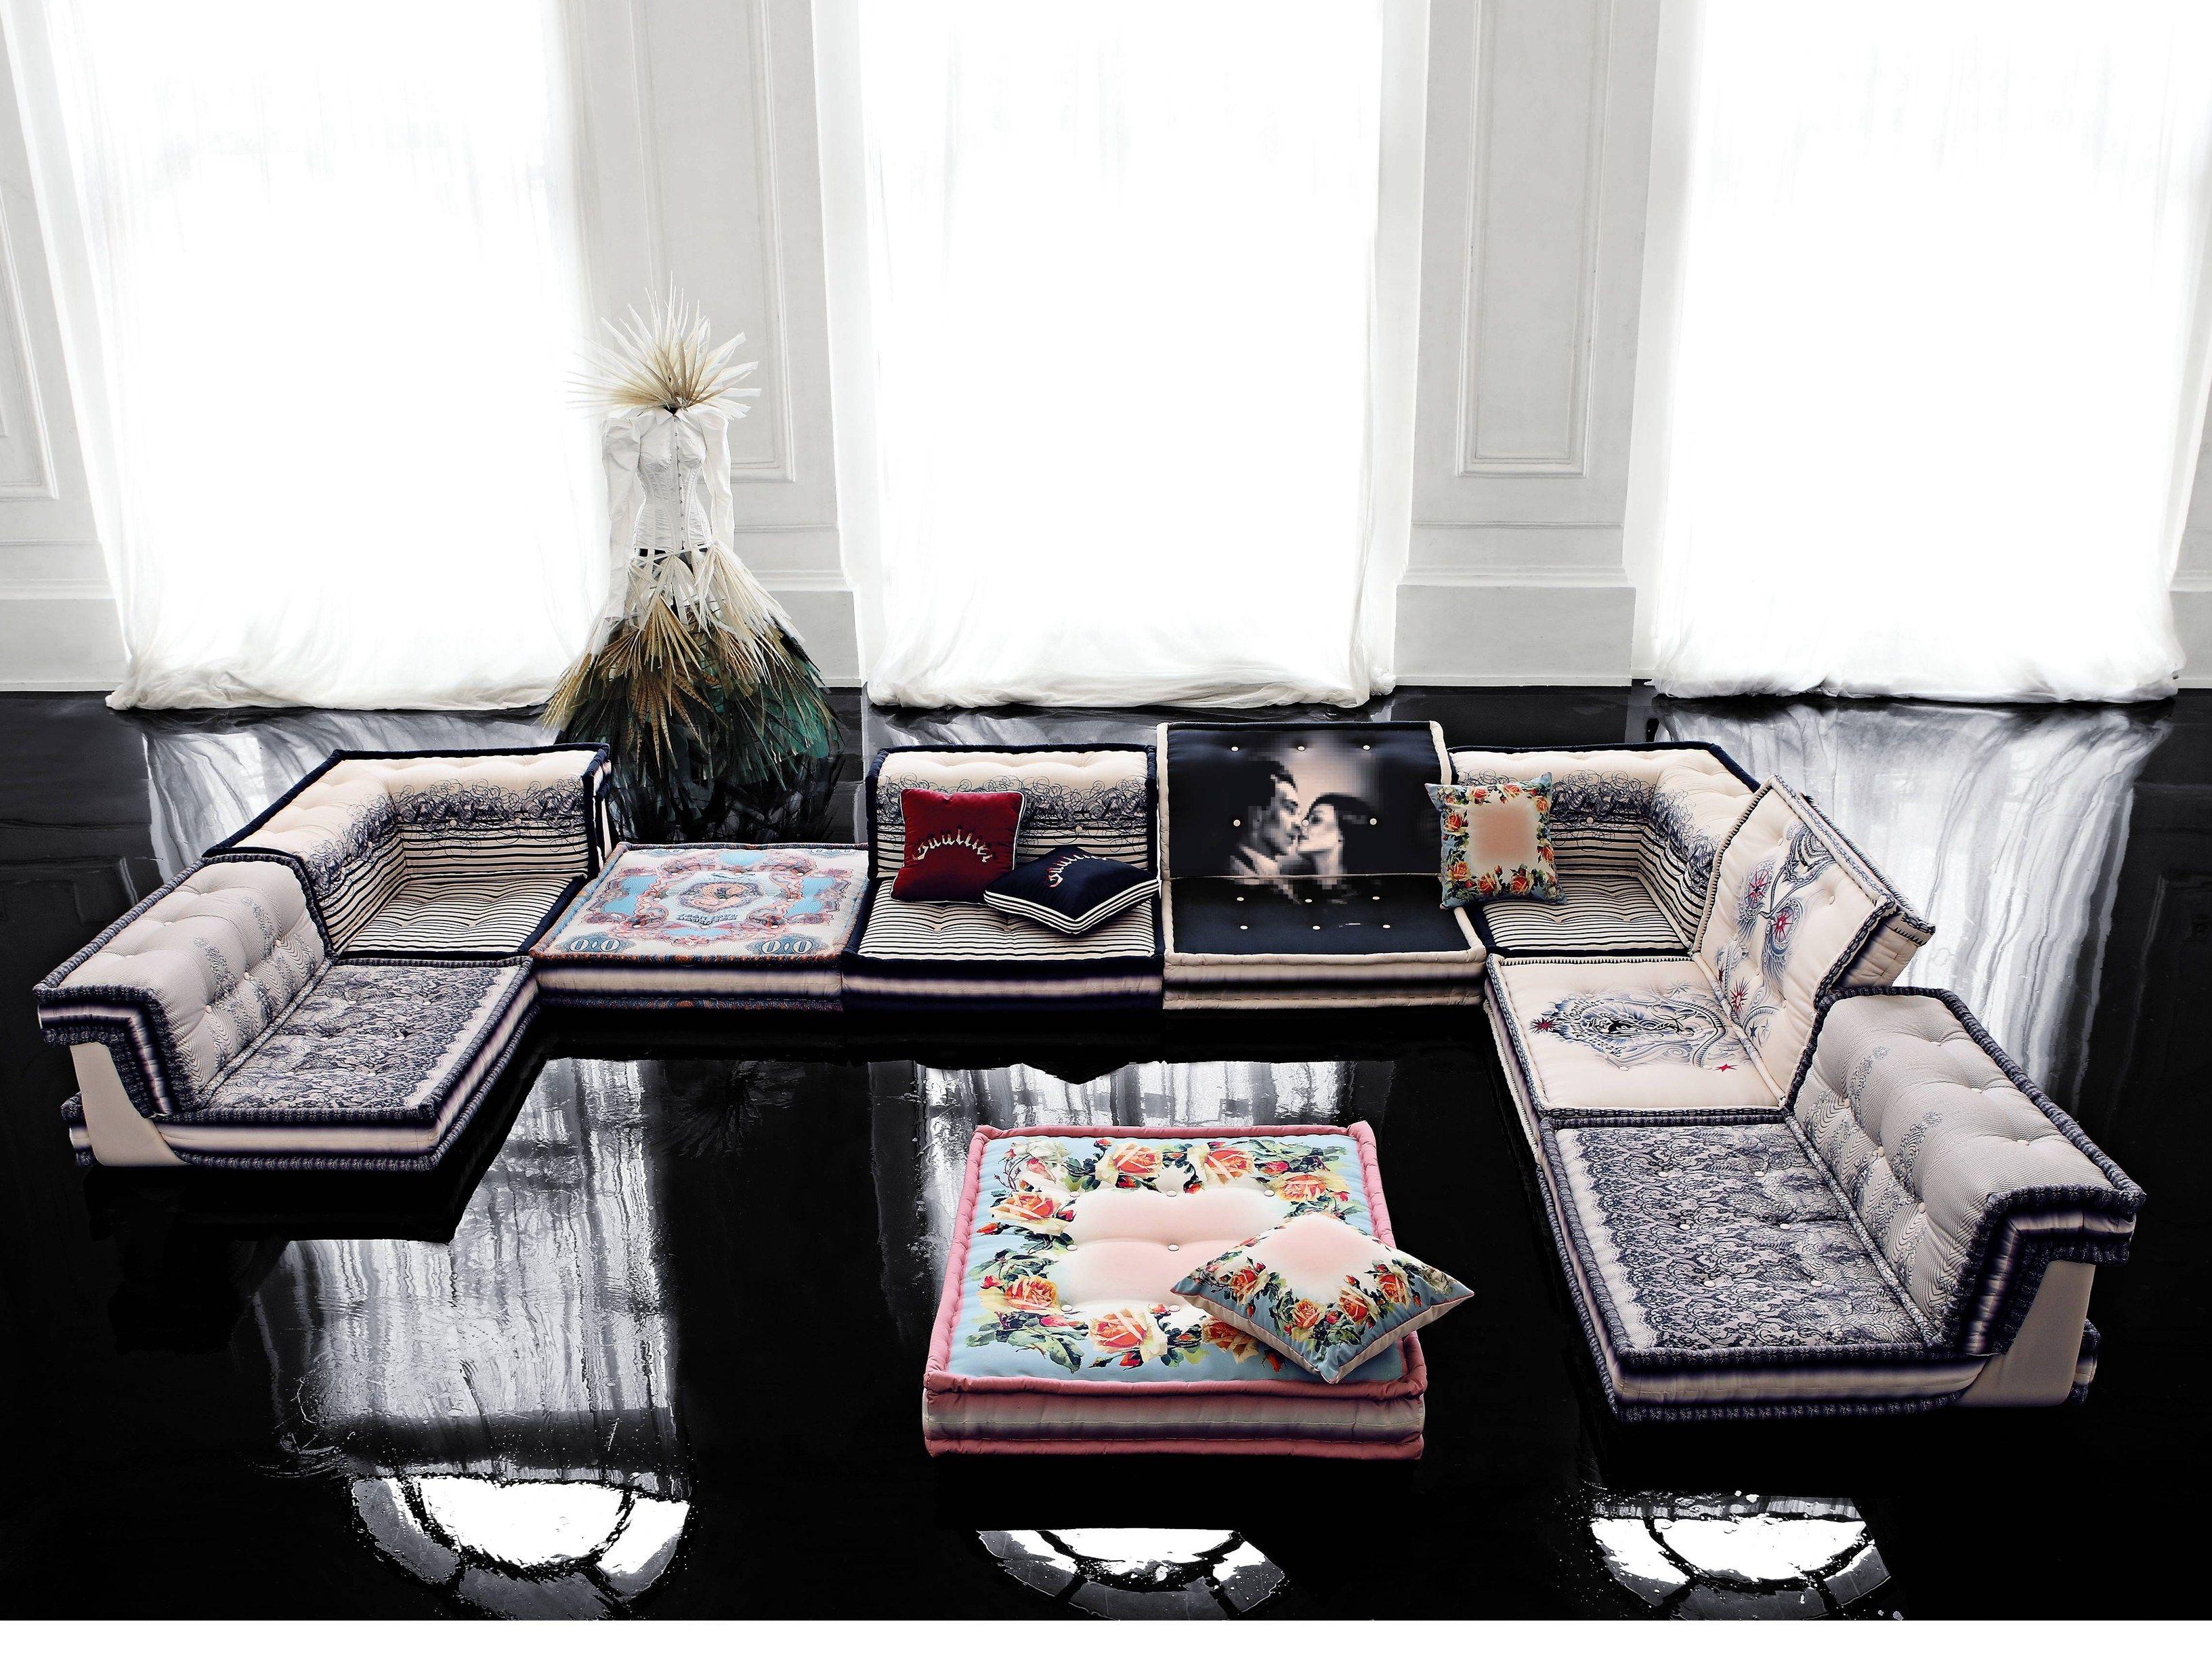 Modulares Sofa Aus Stoff Mah Jong Couture By Roche Bobois Design Hans Hopfer Wohnzimmer Inspiration Modulares Sofa Rauminspiration